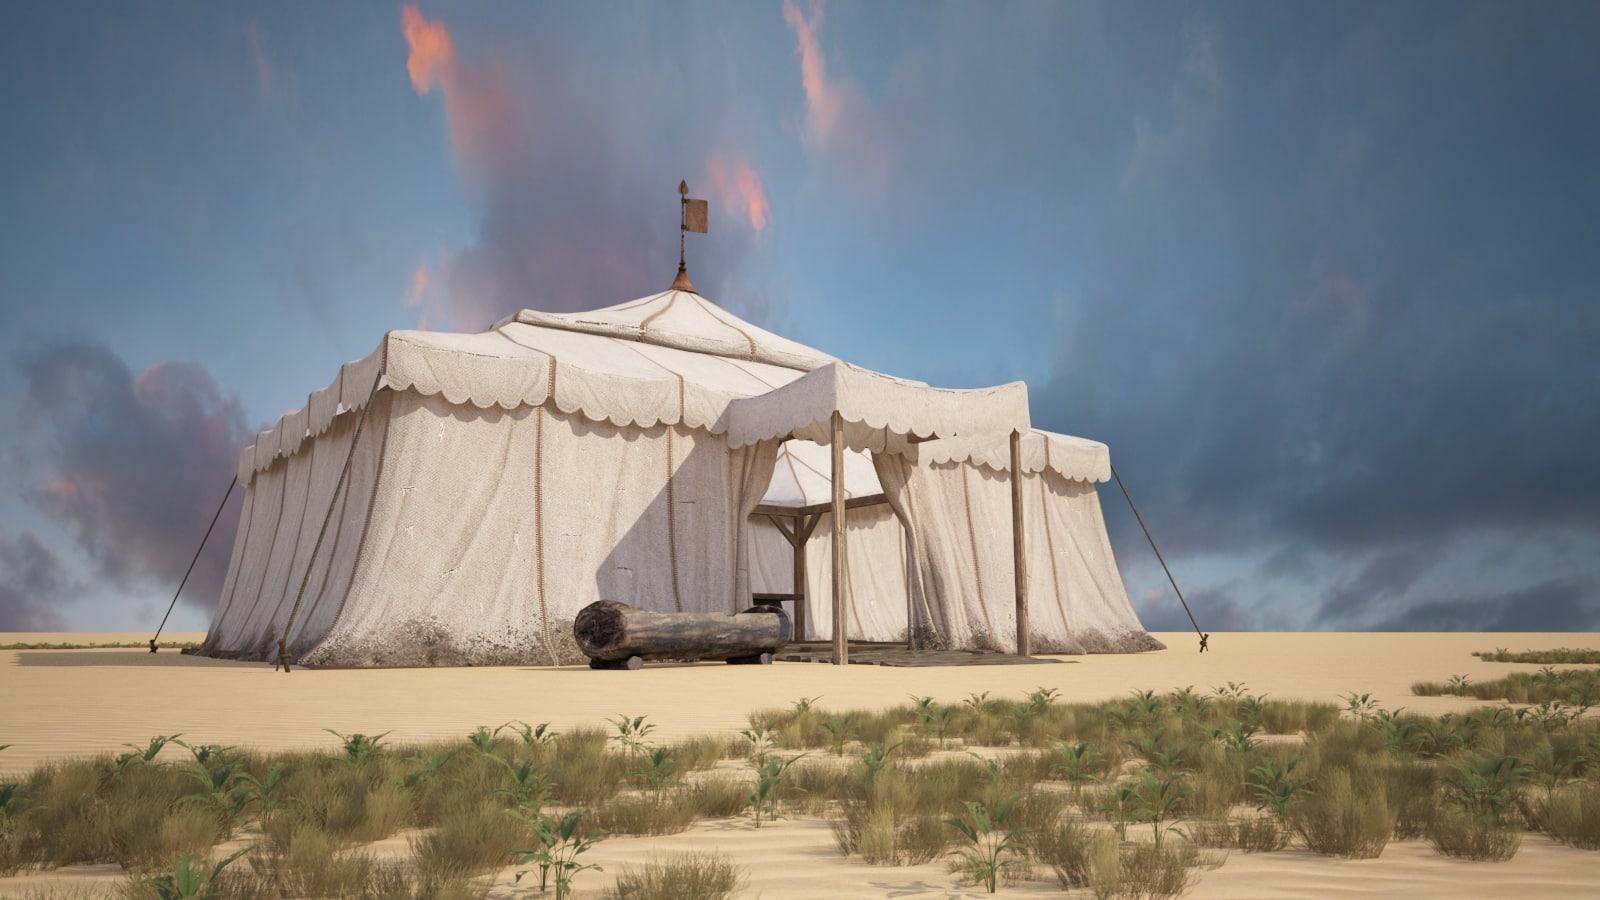 large tent nomadic model